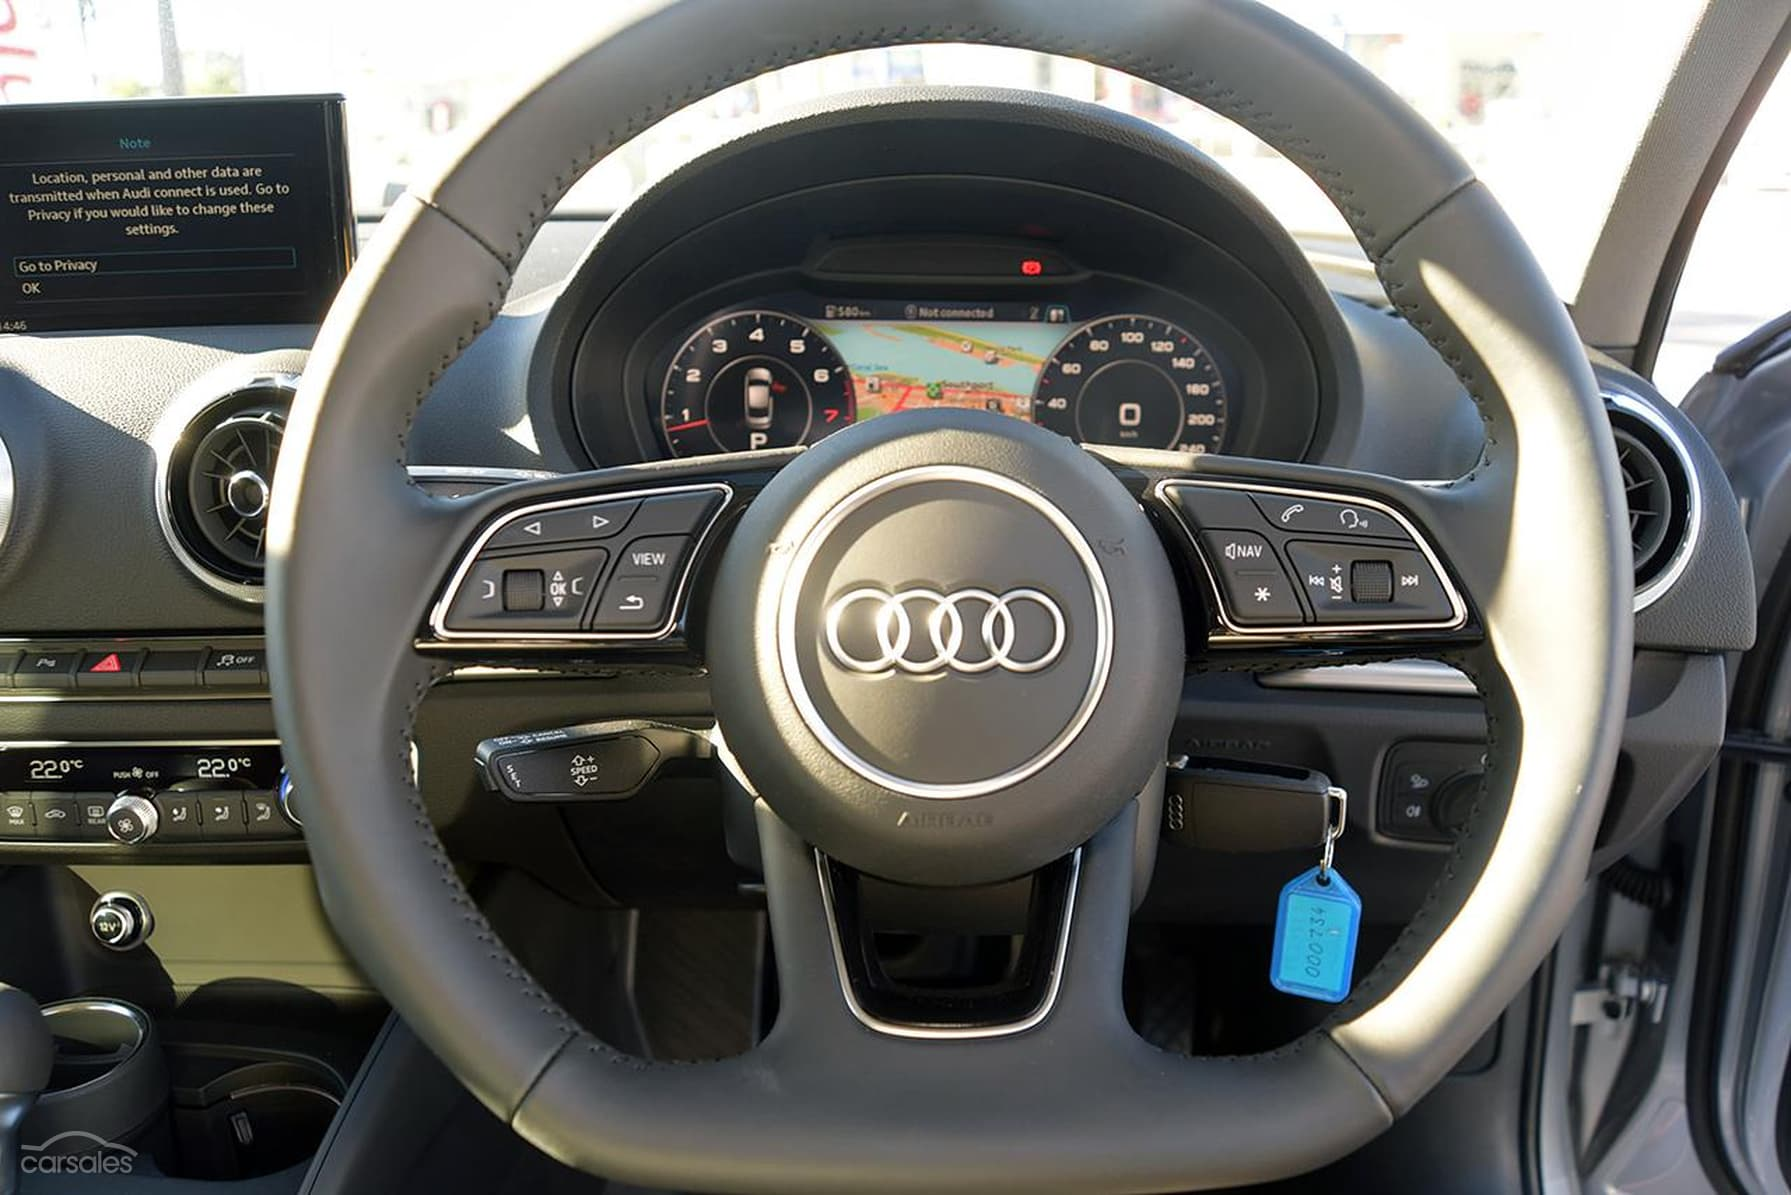 2018 Audi A3 35 TFSI Auto MY19-OAG-AD-17280429 - carsales com au